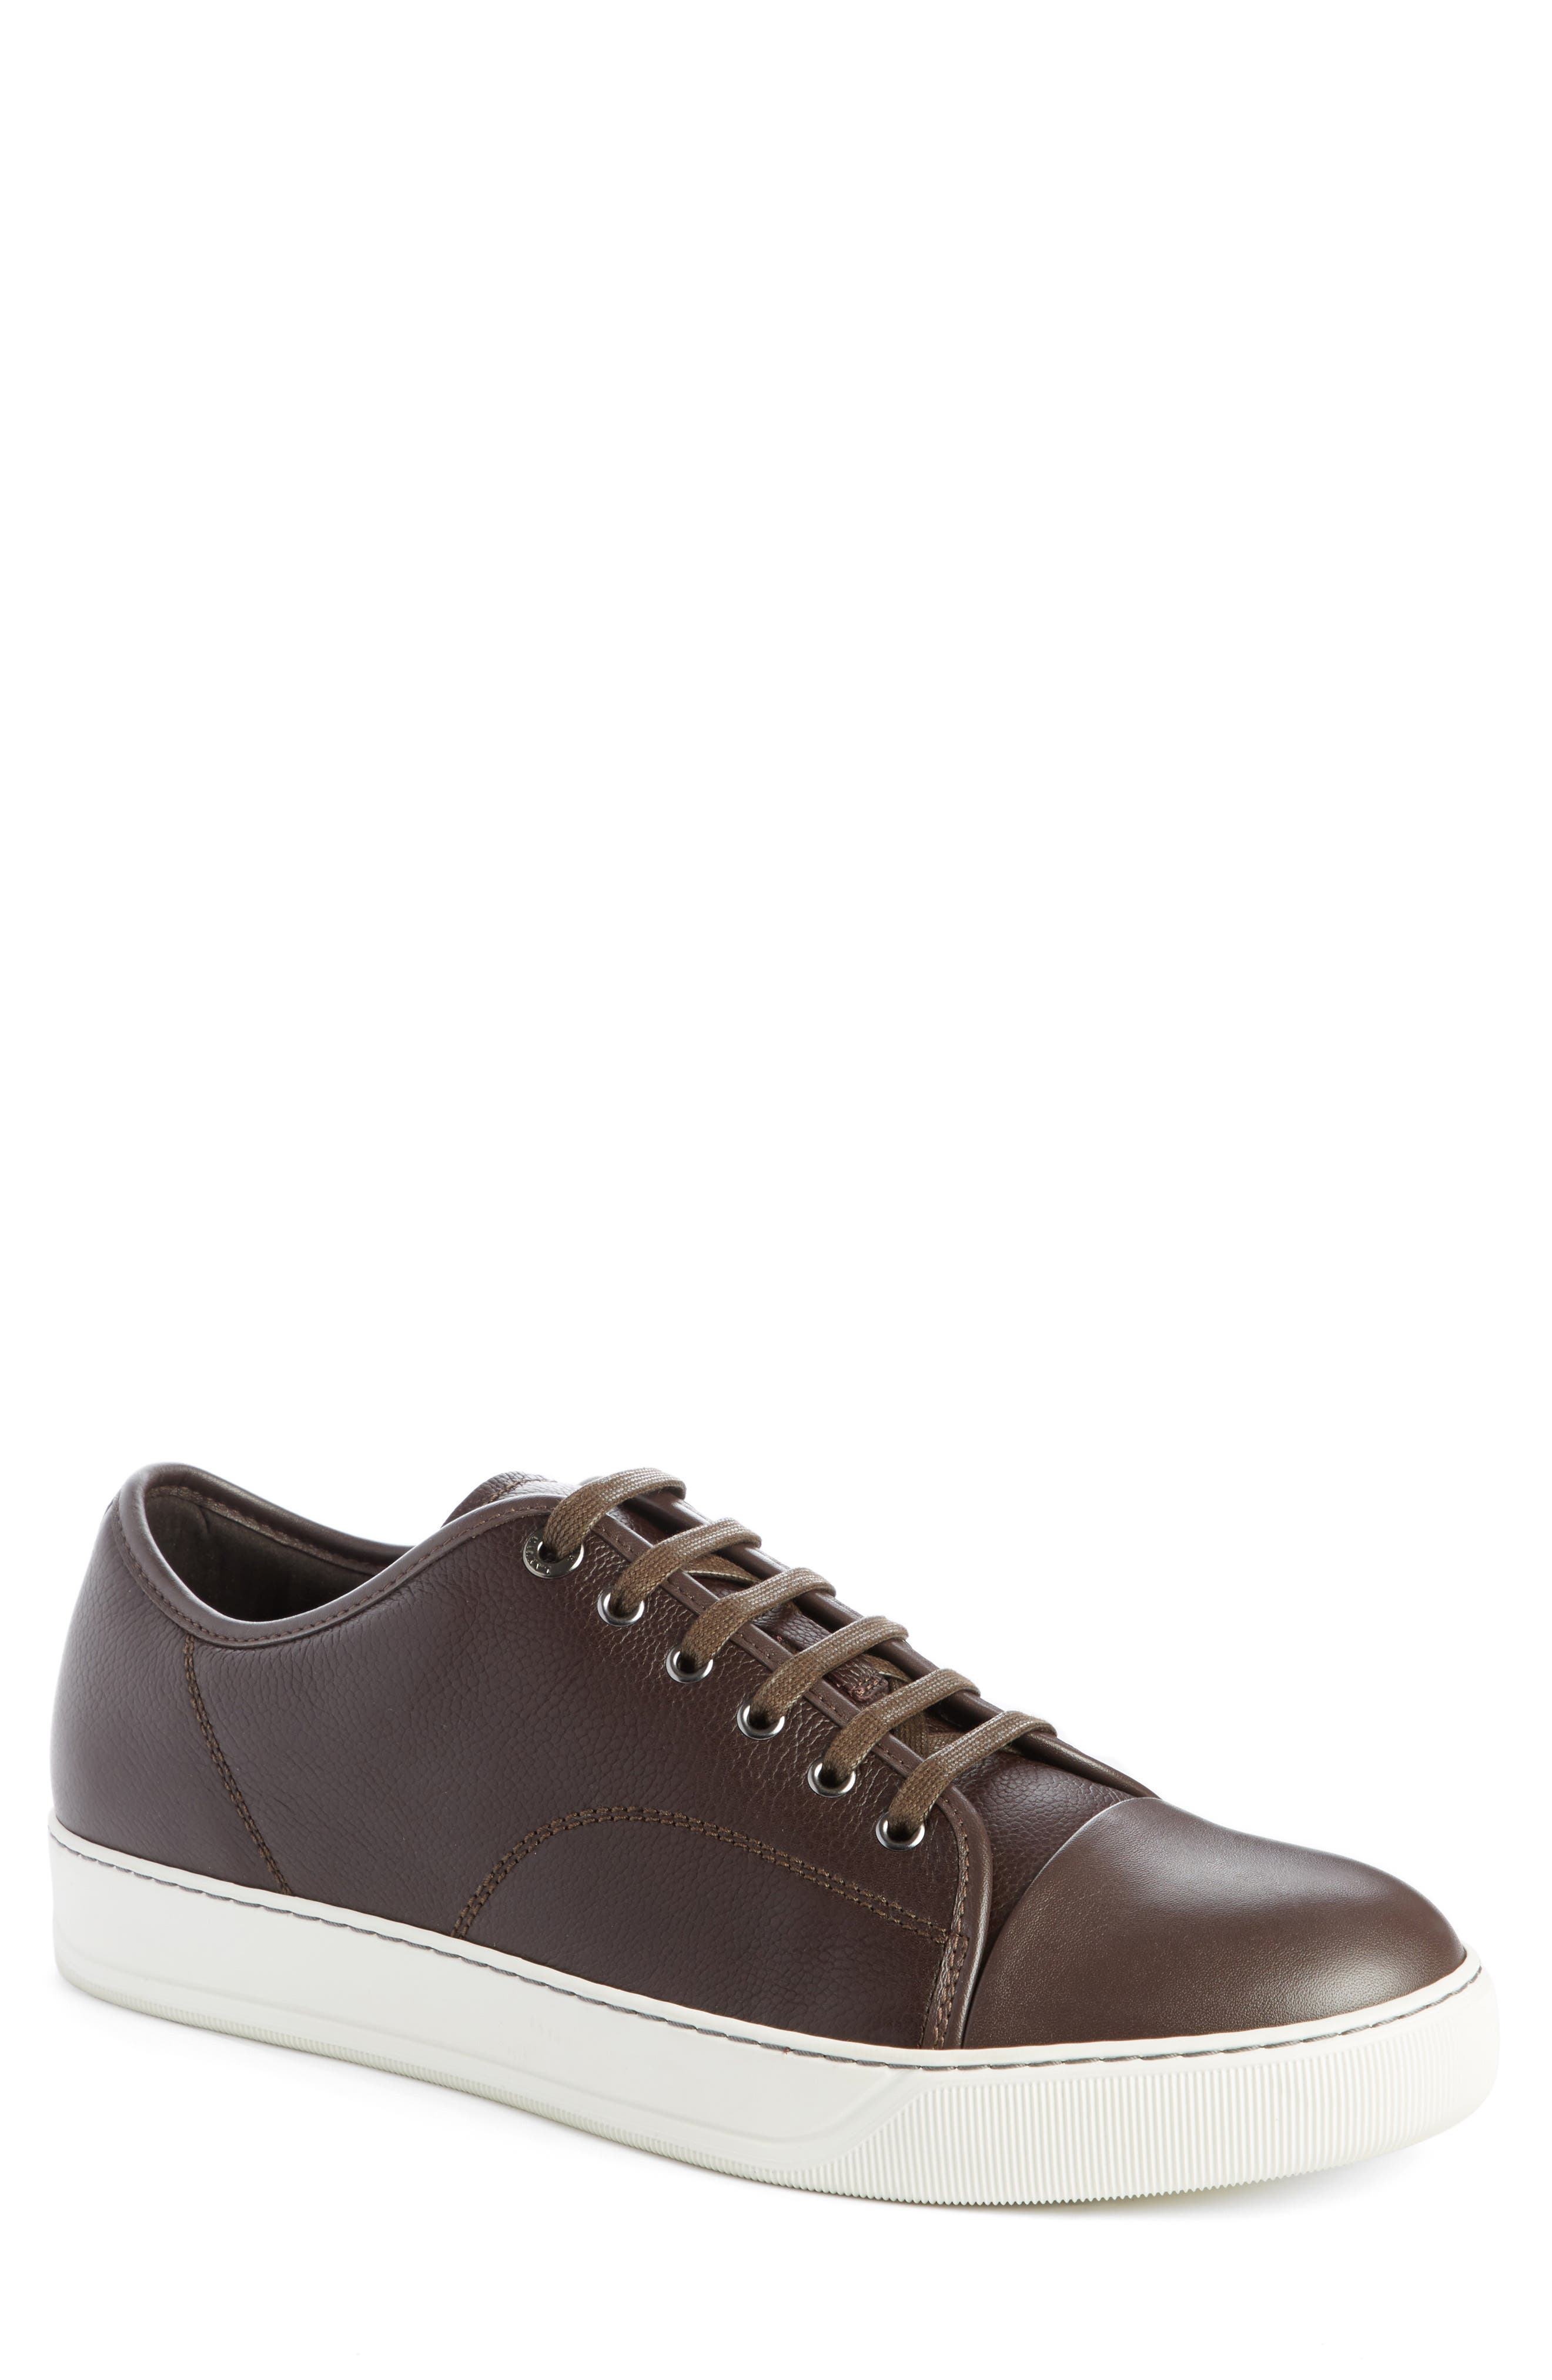 Alternate Image 1 Selected - Lanvin Shiny Cap Toe Sneaker (Men)